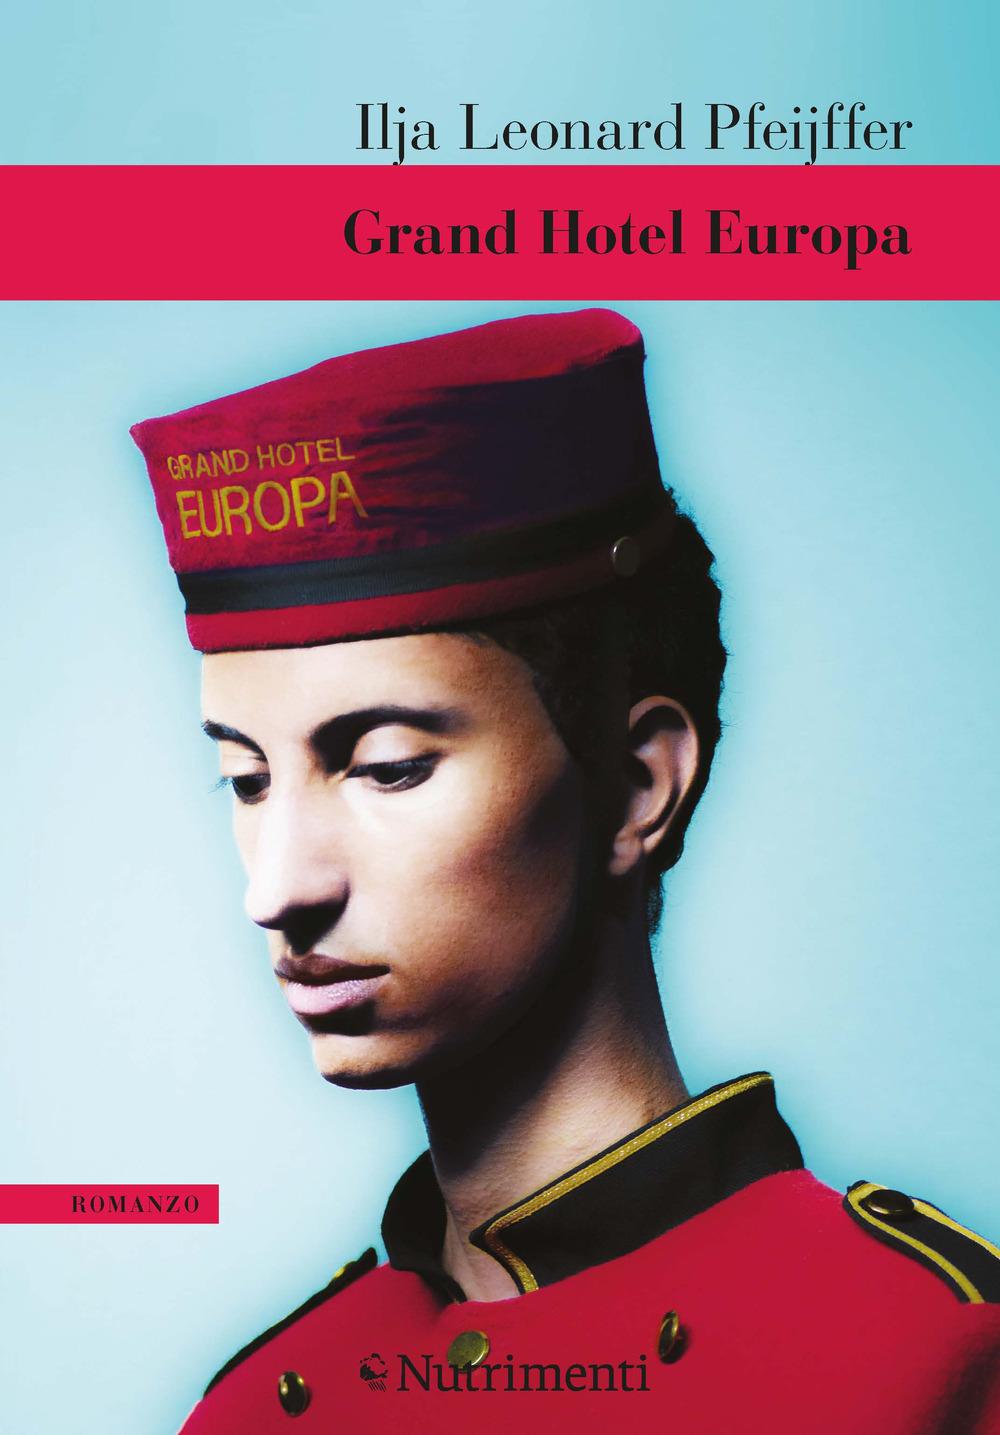 GRAND HOTEL EUROPA - Pfeijffer Ilja Leonard - 9788865947722